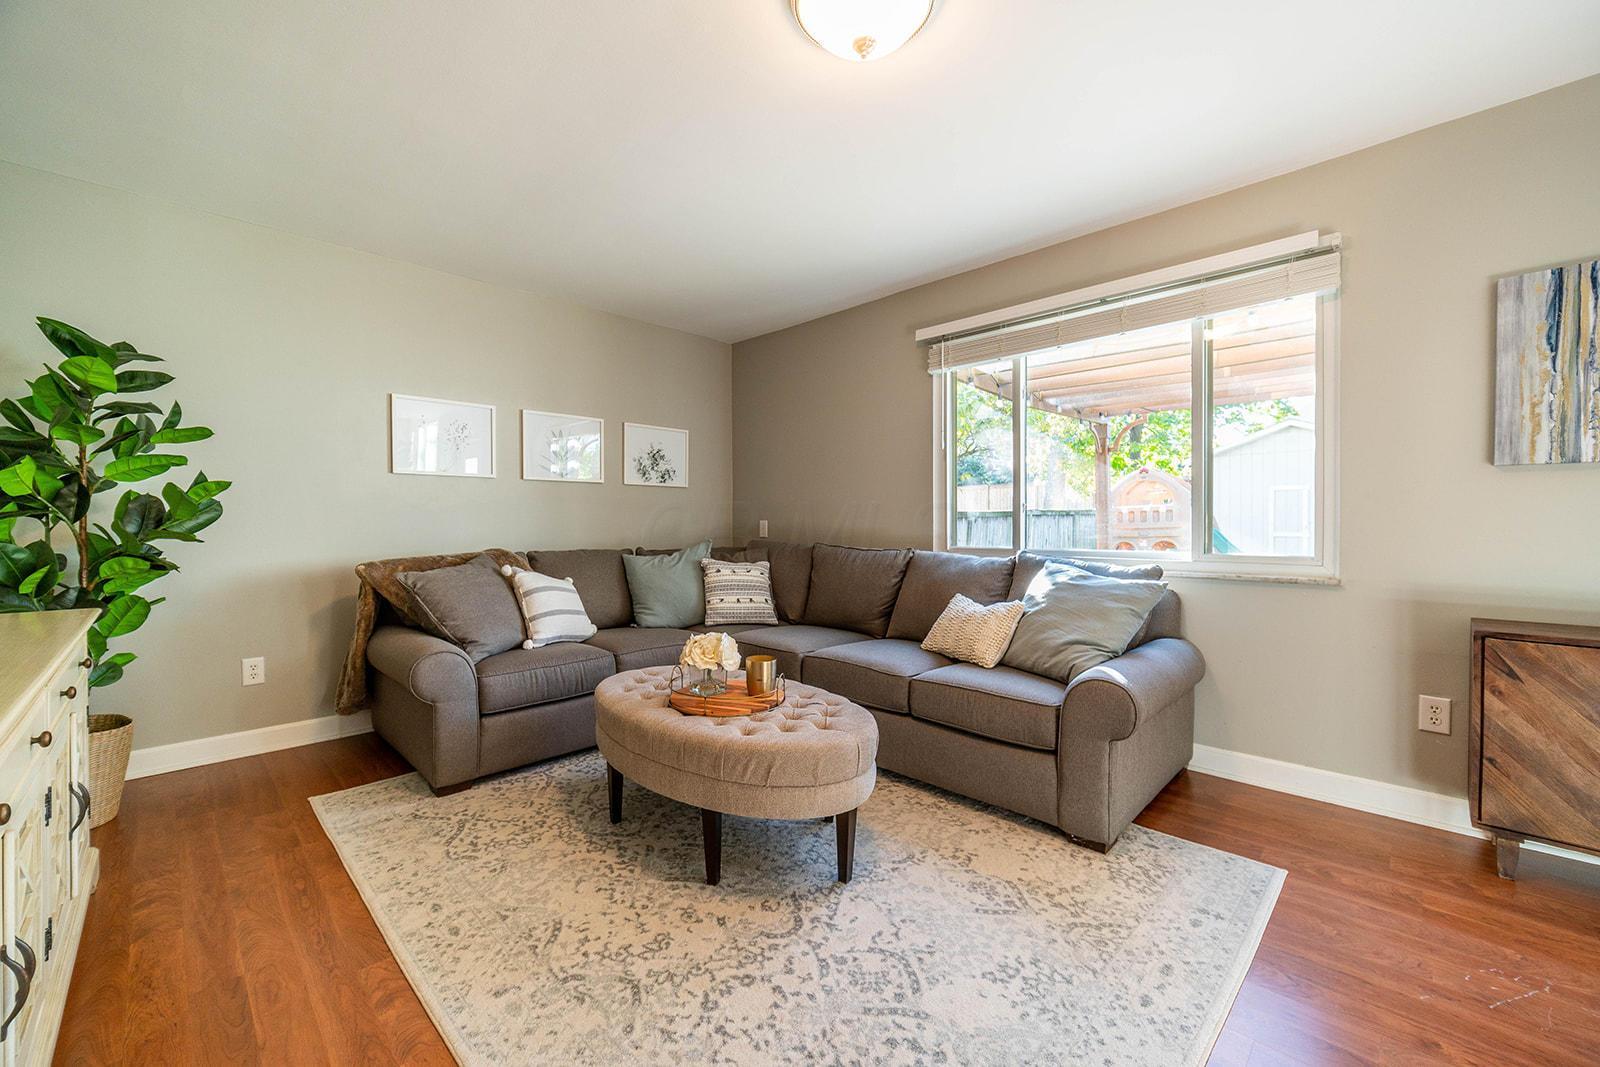 2493 Wellesley Drive, Upper Arlington, Ohio 43221, 3 Bedrooms Bedrooms, ,3 BathroomsBathrooms,Residential,For Sale,Wellesley,220039030